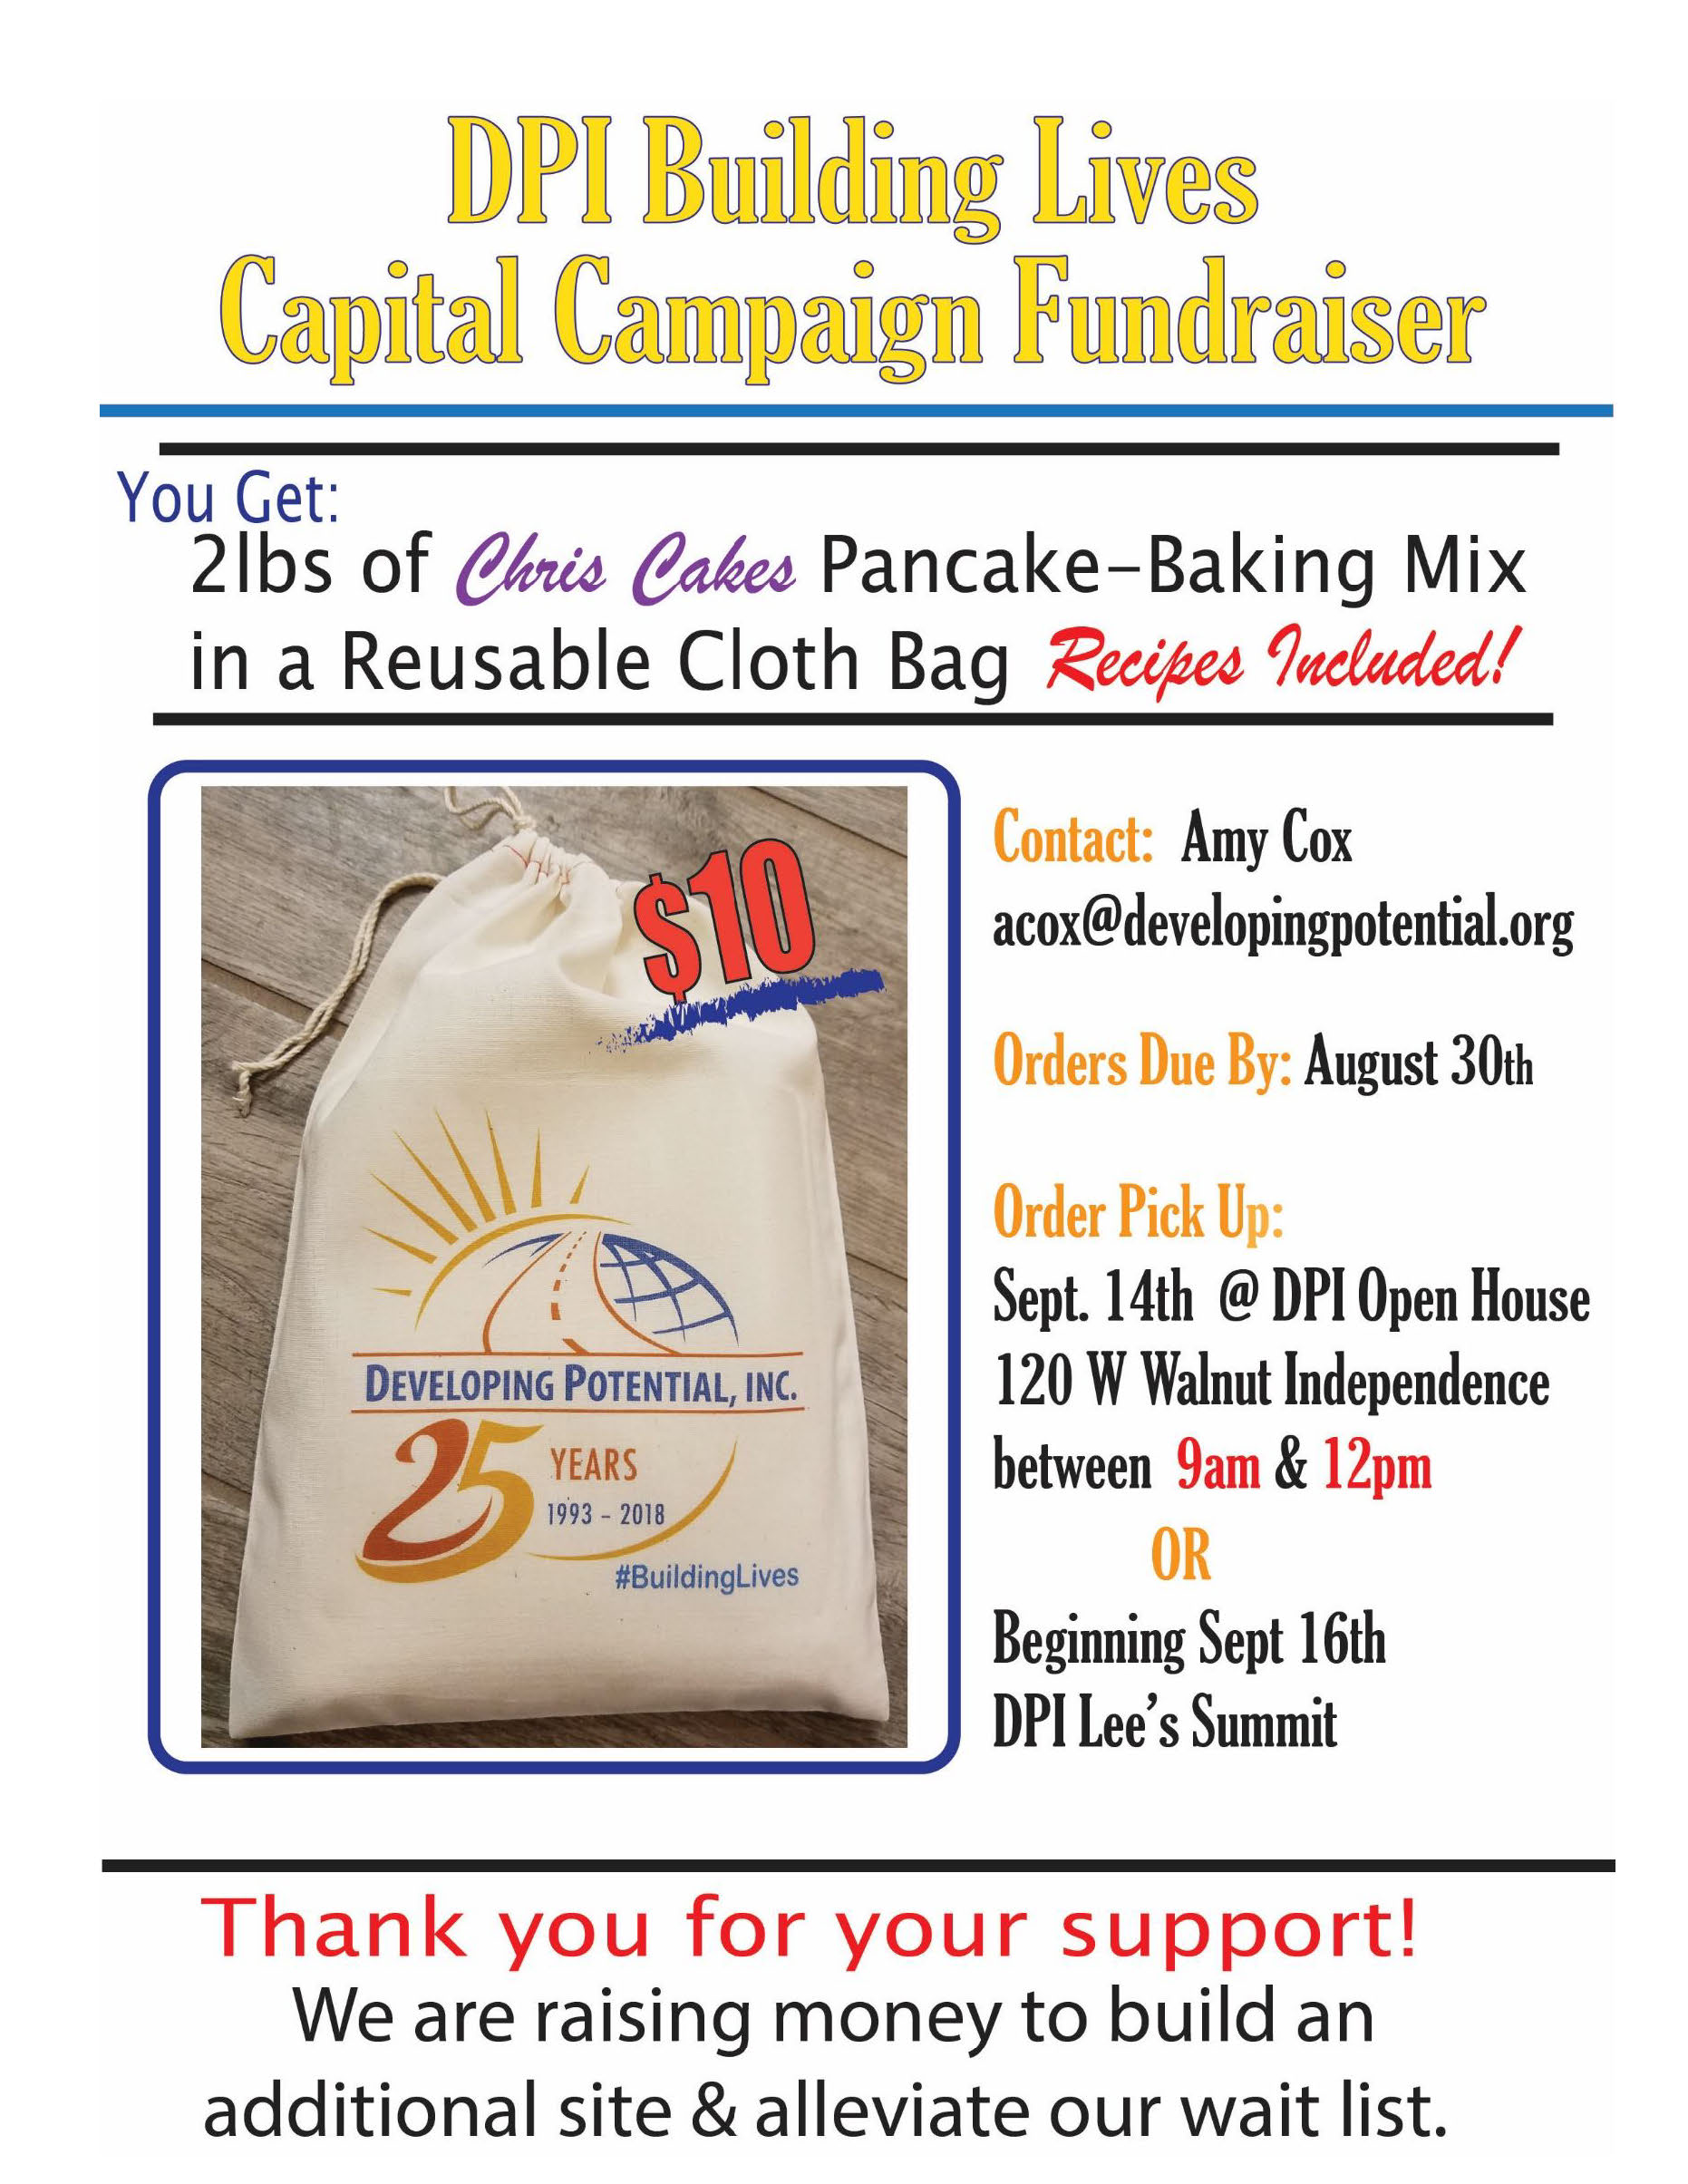 DPI Chris Cakes Flyer Download